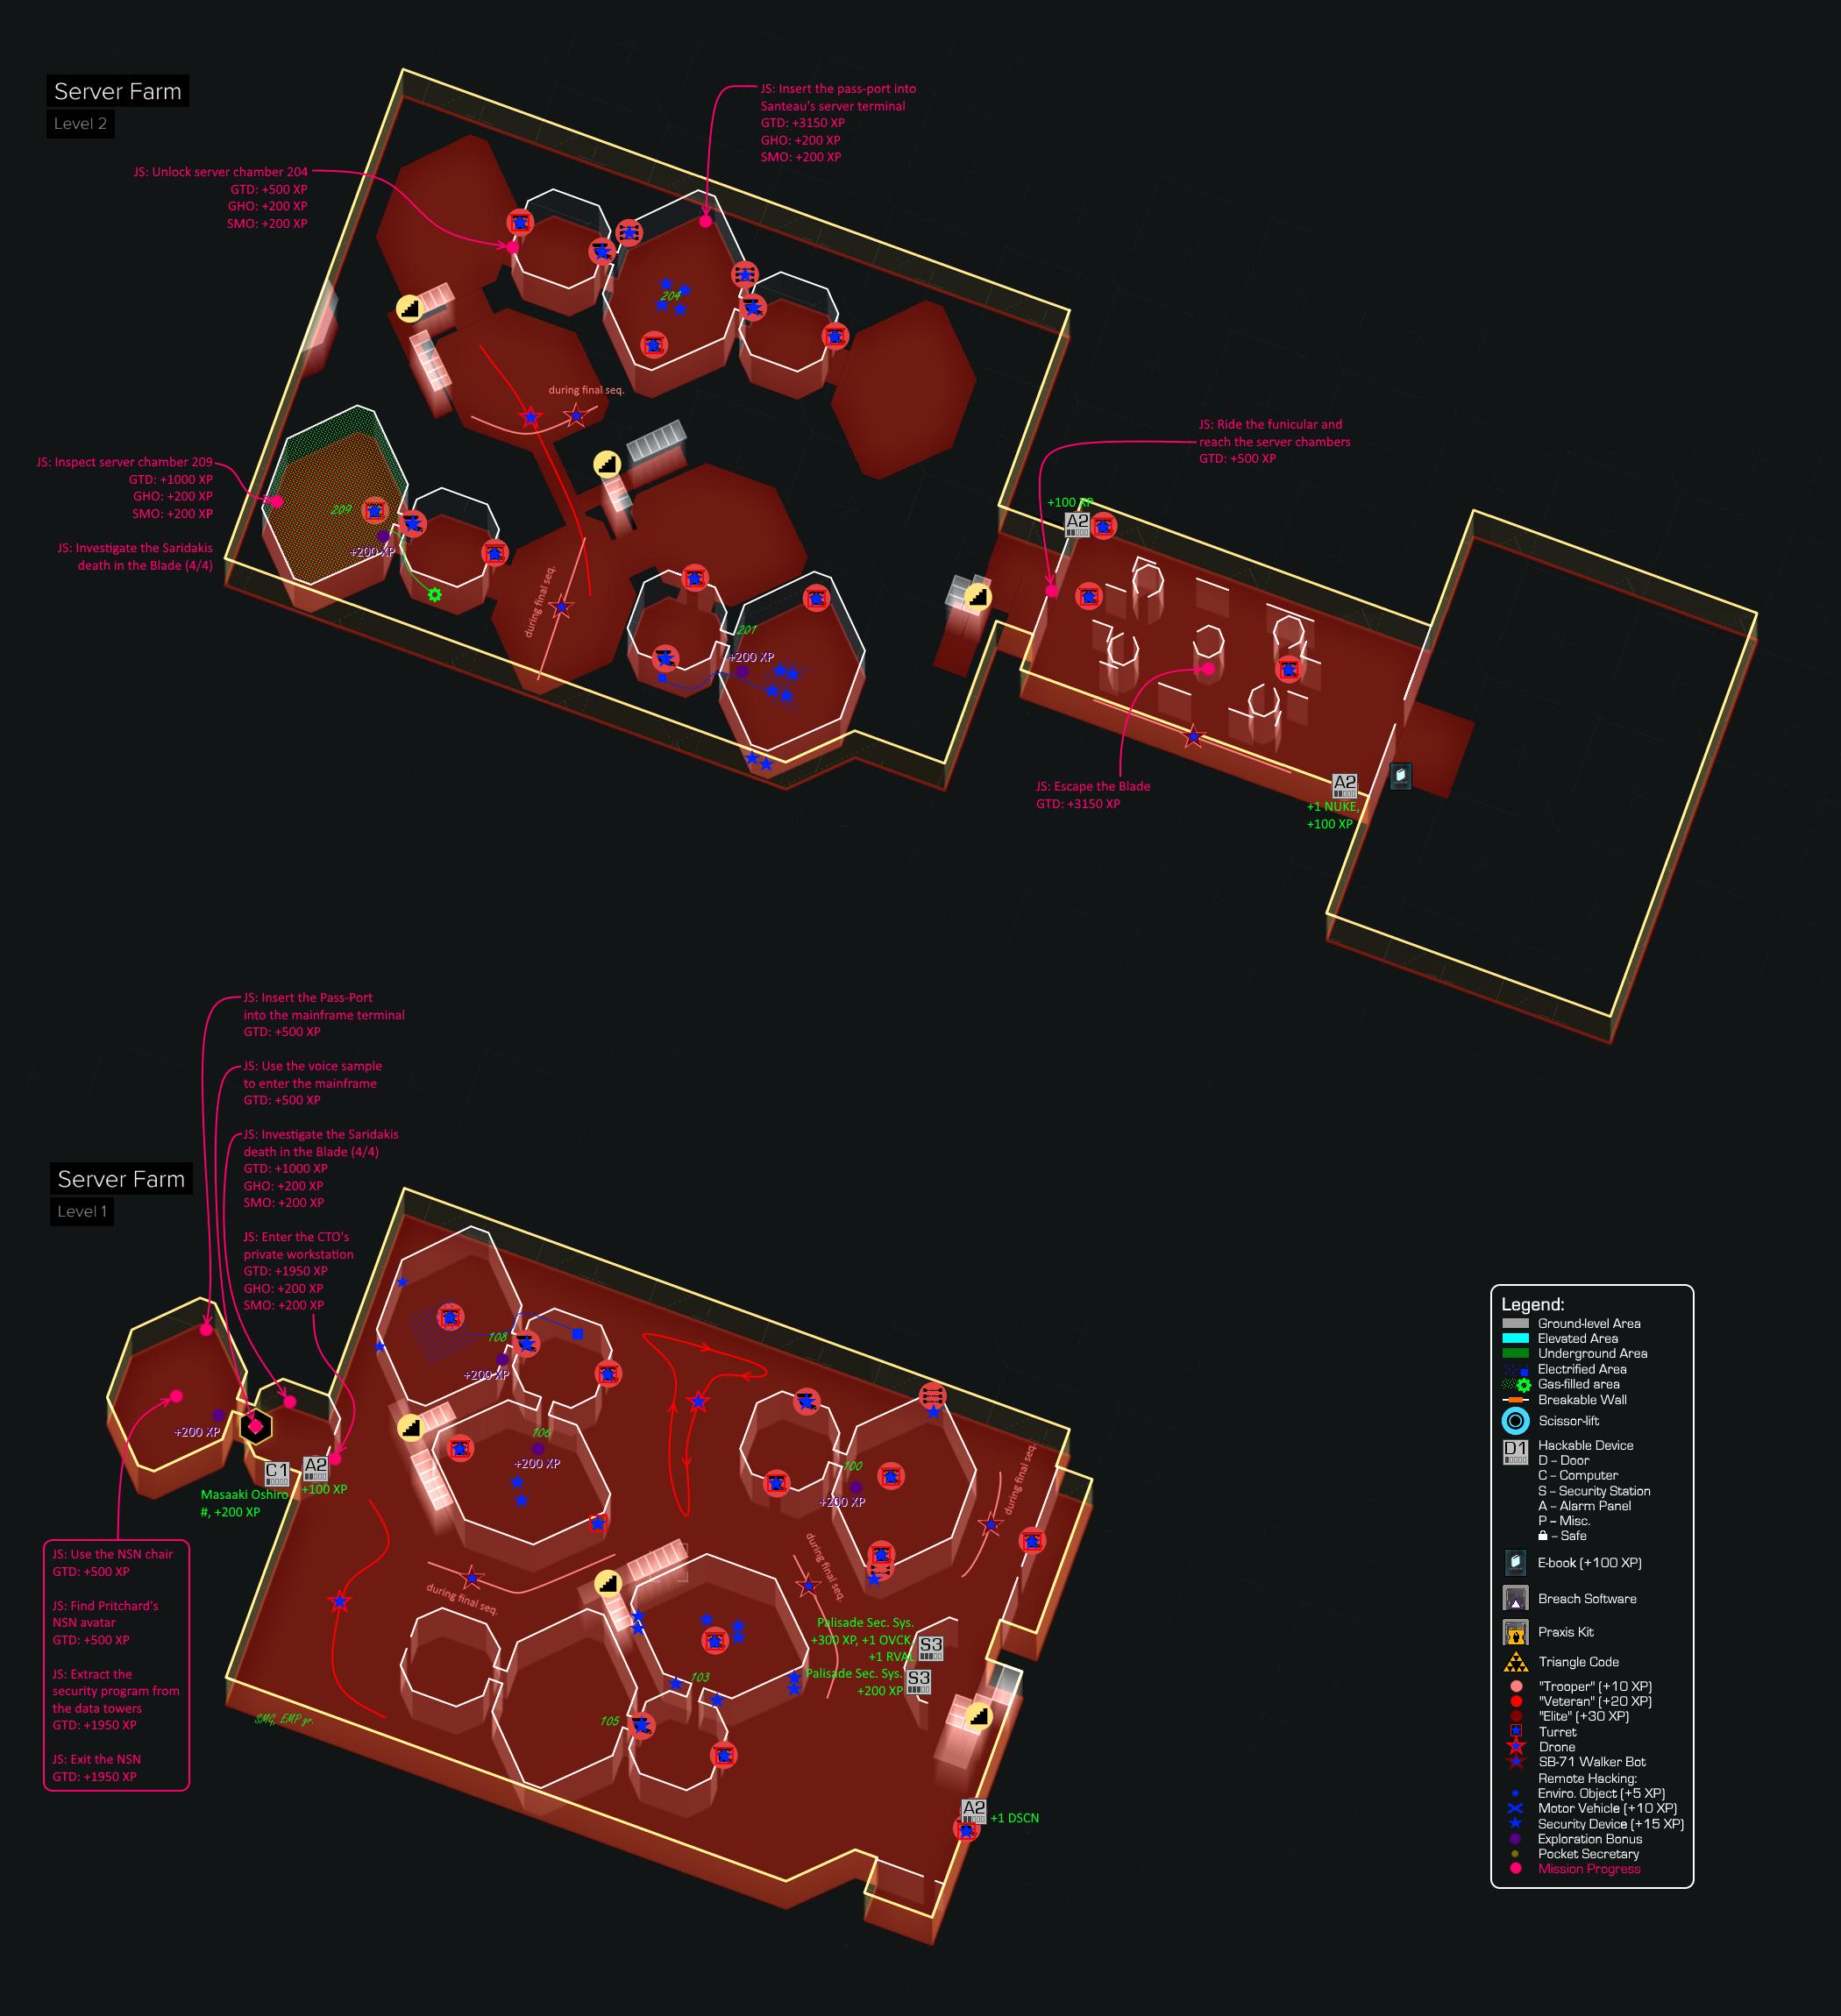 System Rift Walkthrough Deus Ex Wiki Fandom Powered By Wikia Fotos Recomended Stun Gun Circuit Diagram Annotated Map Of The Server Farm Area